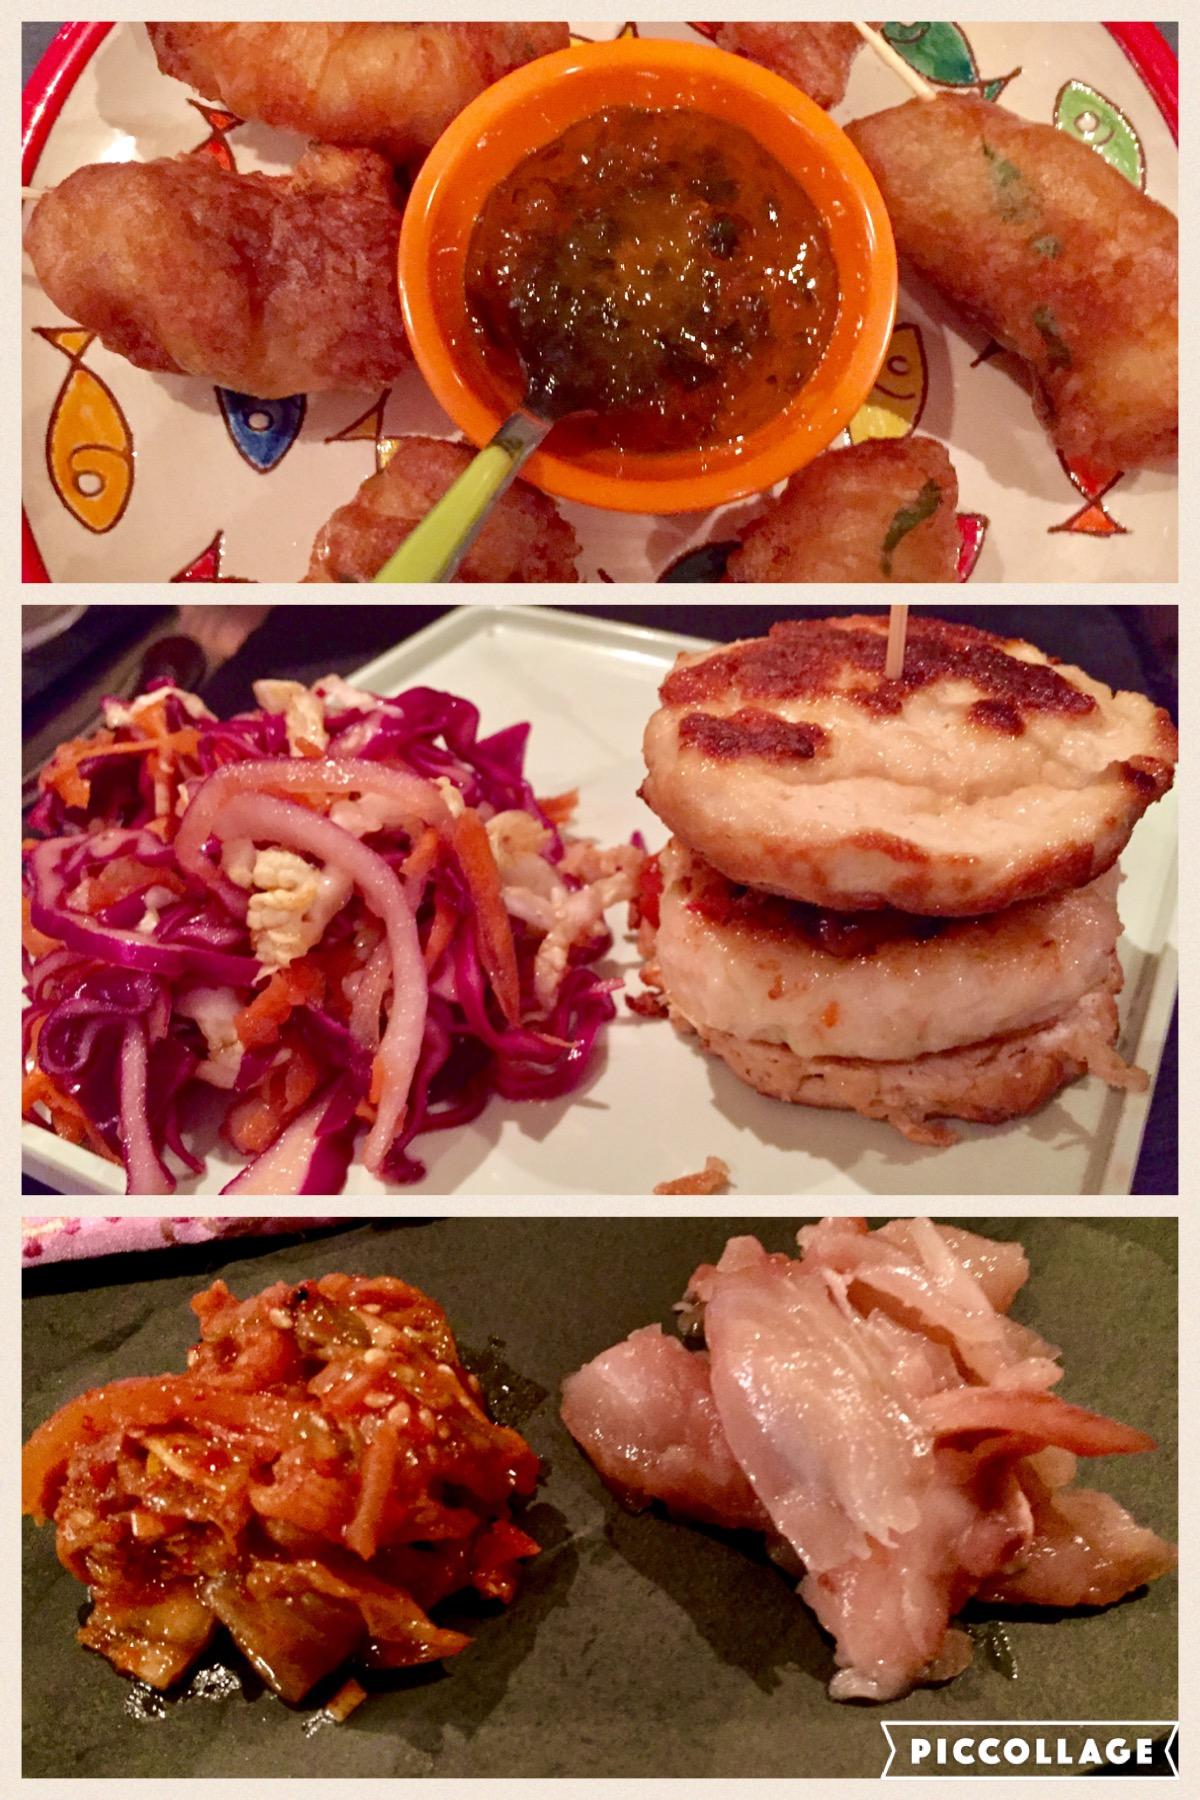 Marinated monkfish goujons, tequila batter and homemade jalapeno jam (top)  Tofu Slider, Seafood lemongrass patty, pickled shiitake, unami ketchup, truffle ponzu slaw (middle)  Ginger cured mackerel, sesame kimchi (bottom)